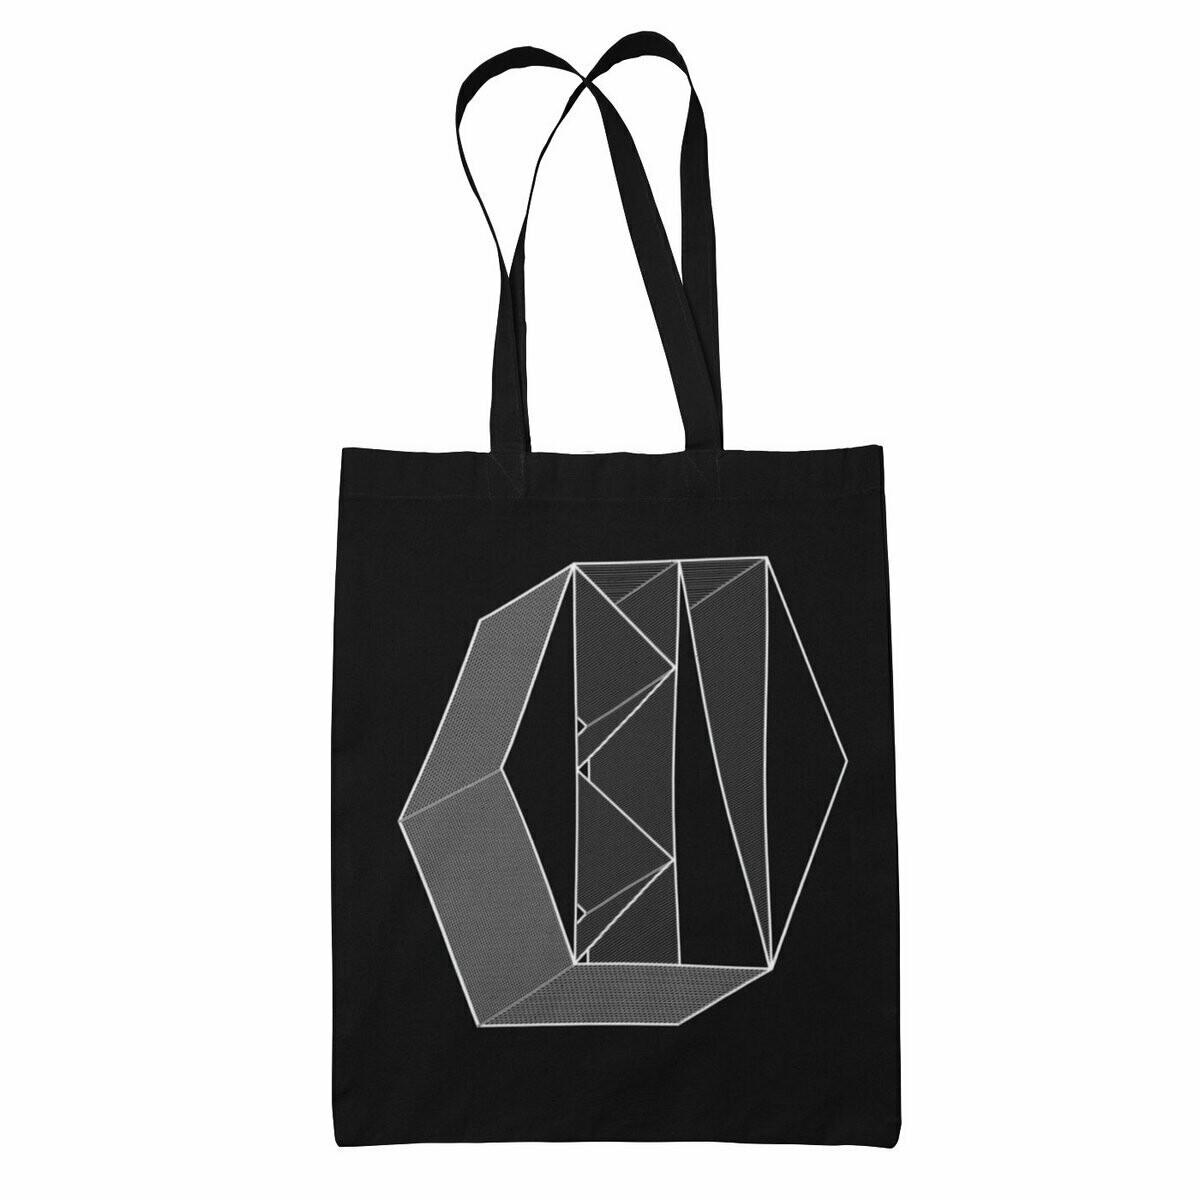 3DLogo Design Tote Bag